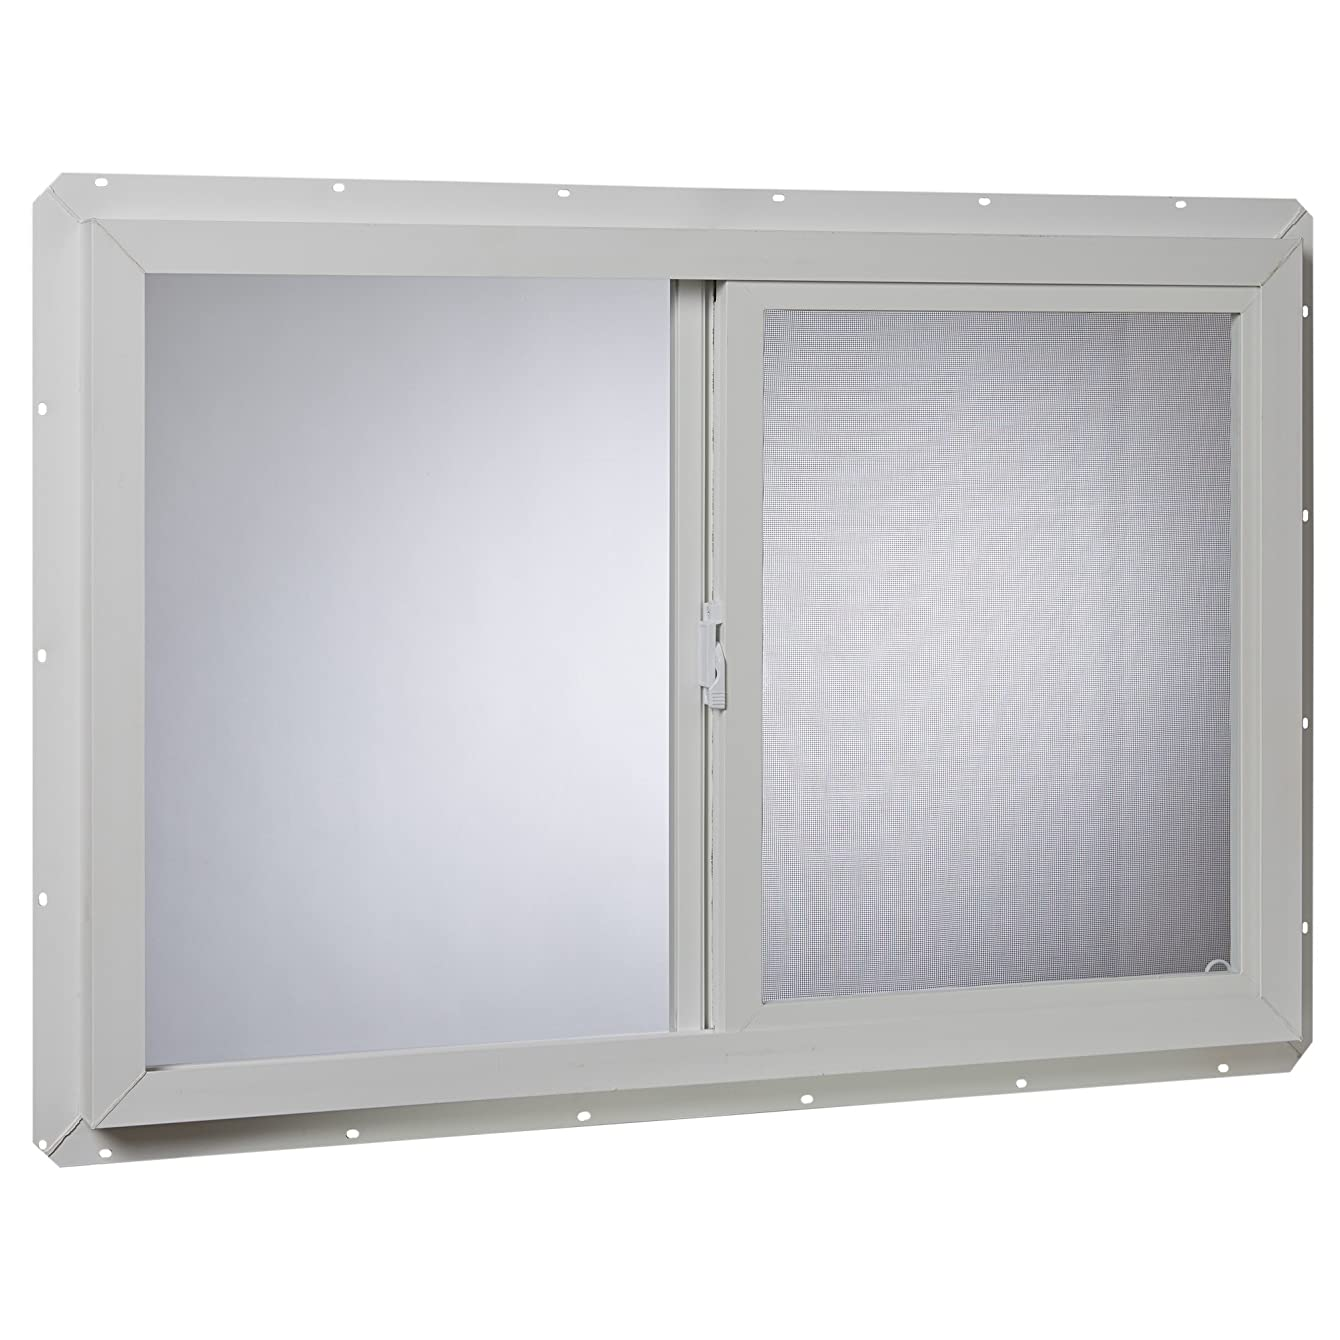 Park Ridge Products VUSI3624PR Park Ridge Slider 36 in. x 24 in. Utility Insulated Sliding Vinyl Window – White, zrxhvlkkfraeo07